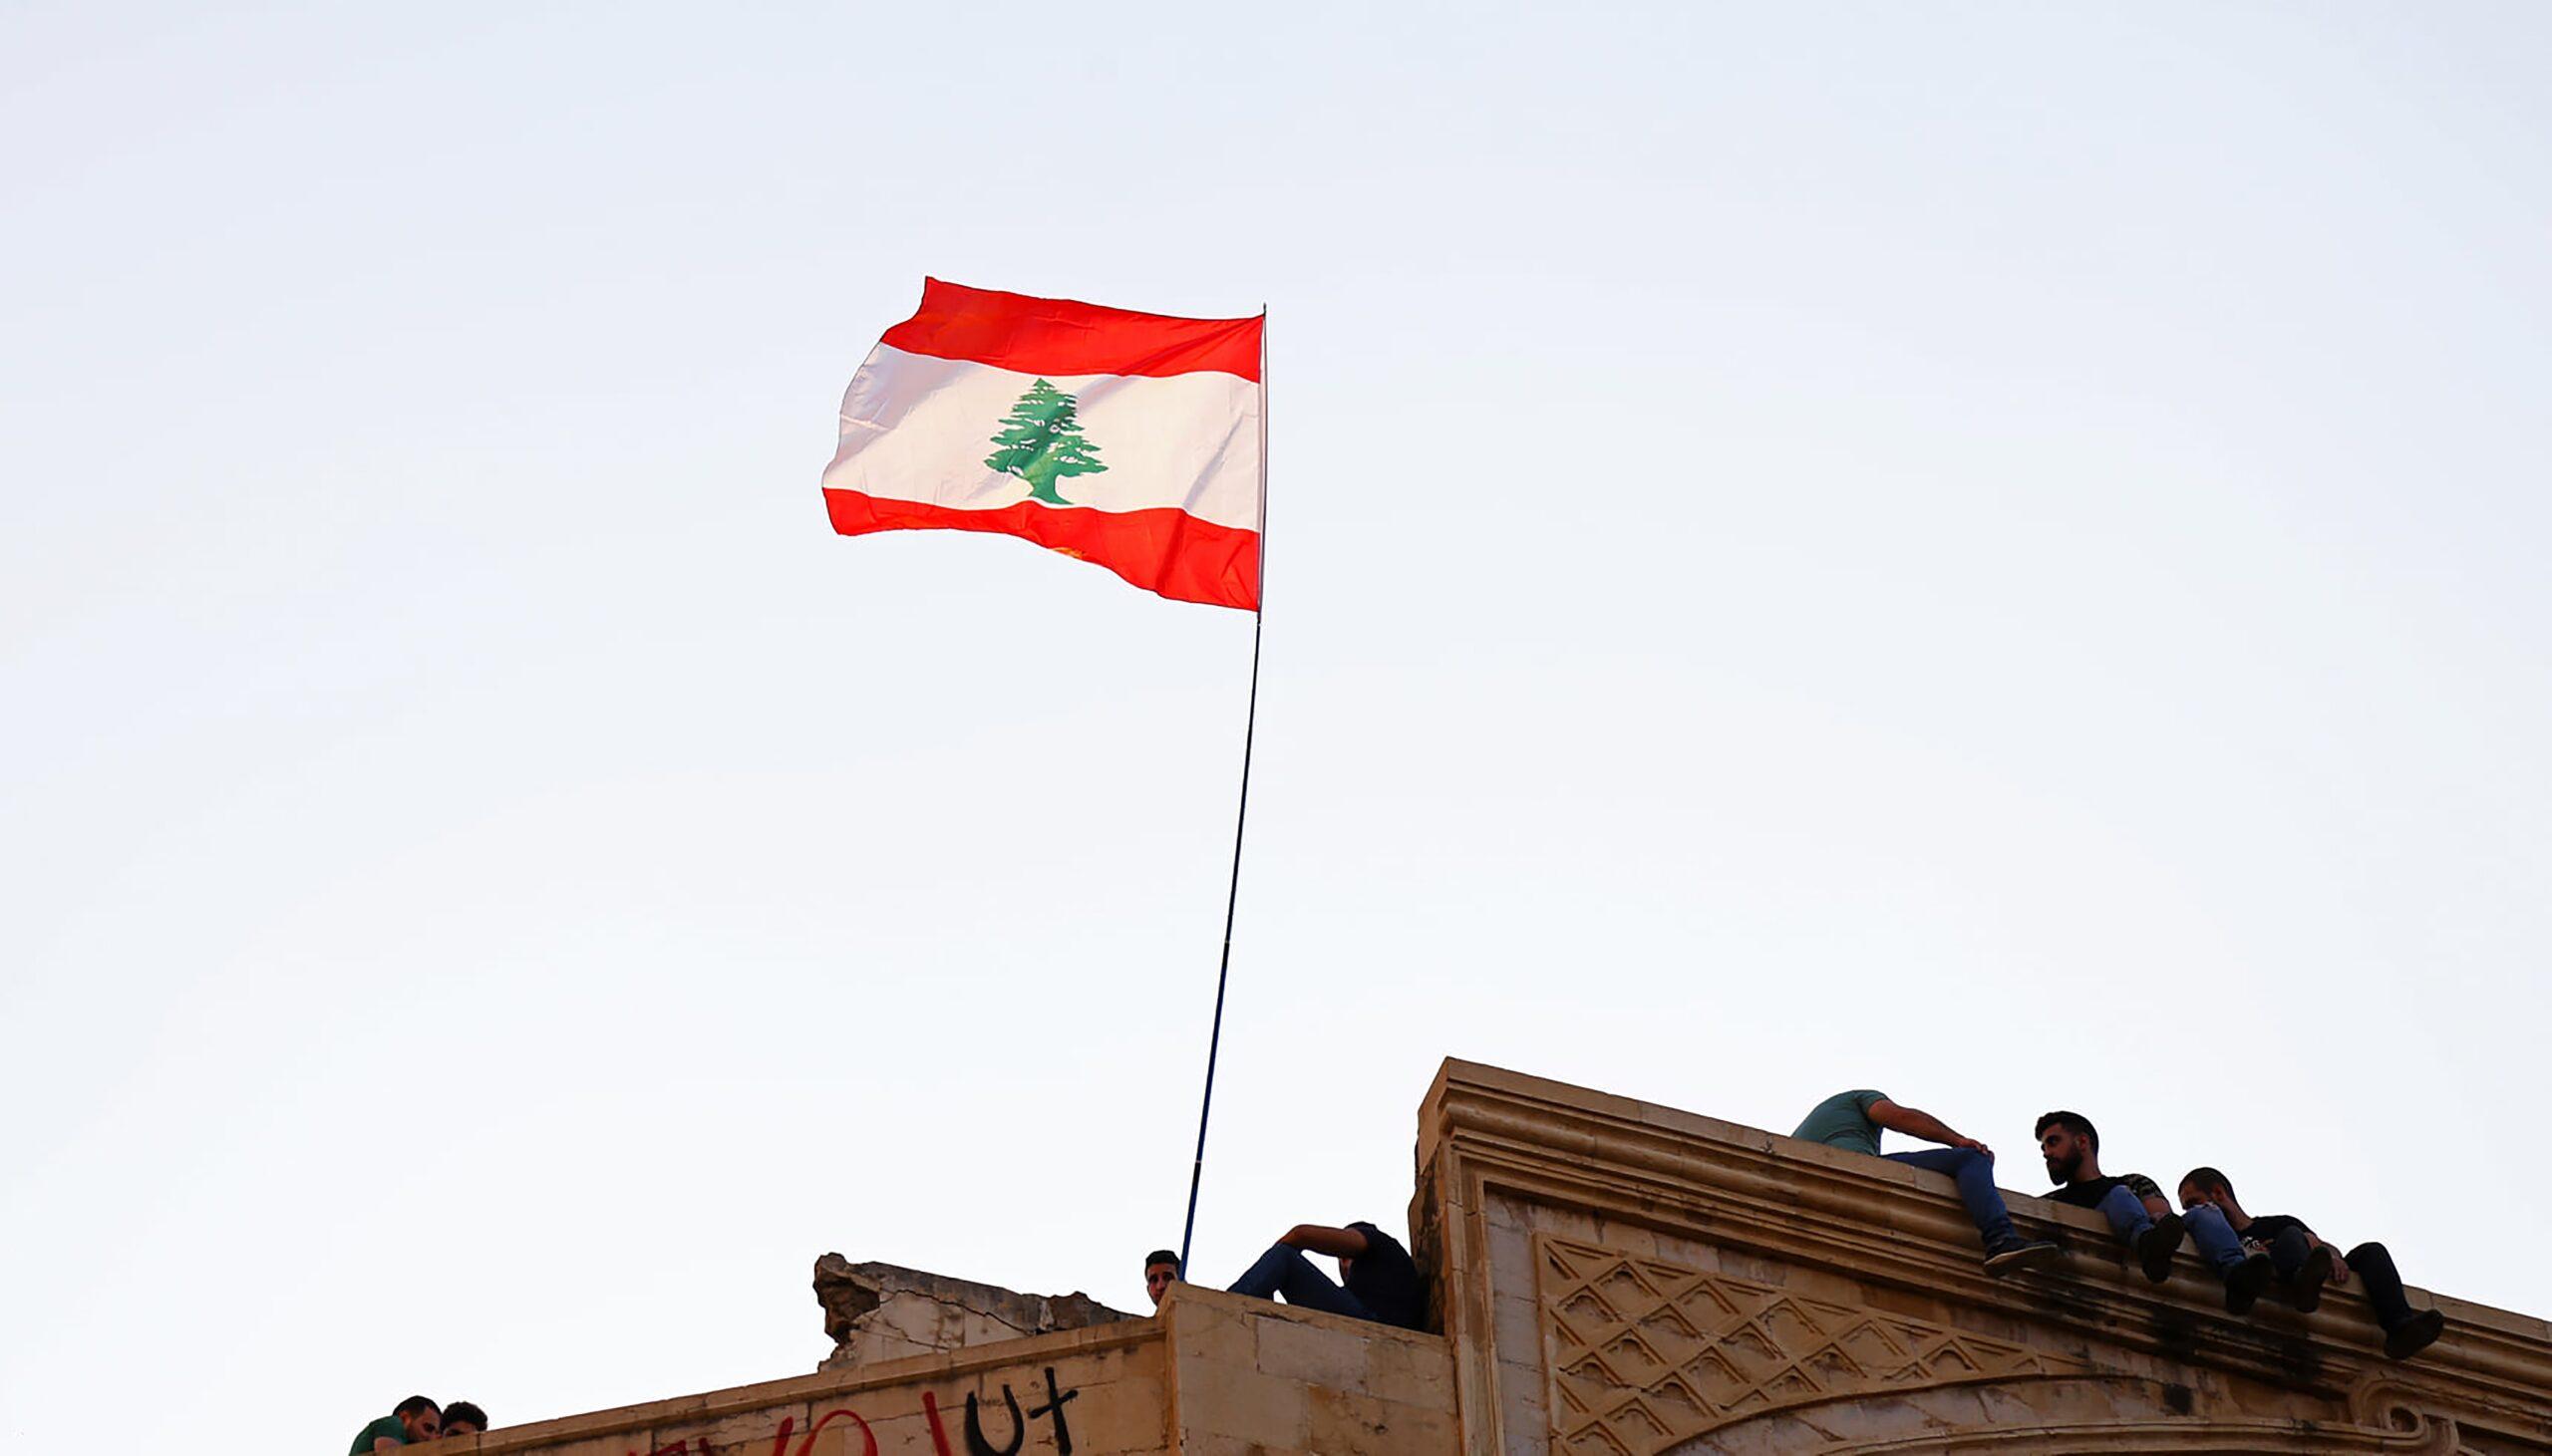 Le drapeau libanais à Beyrouth